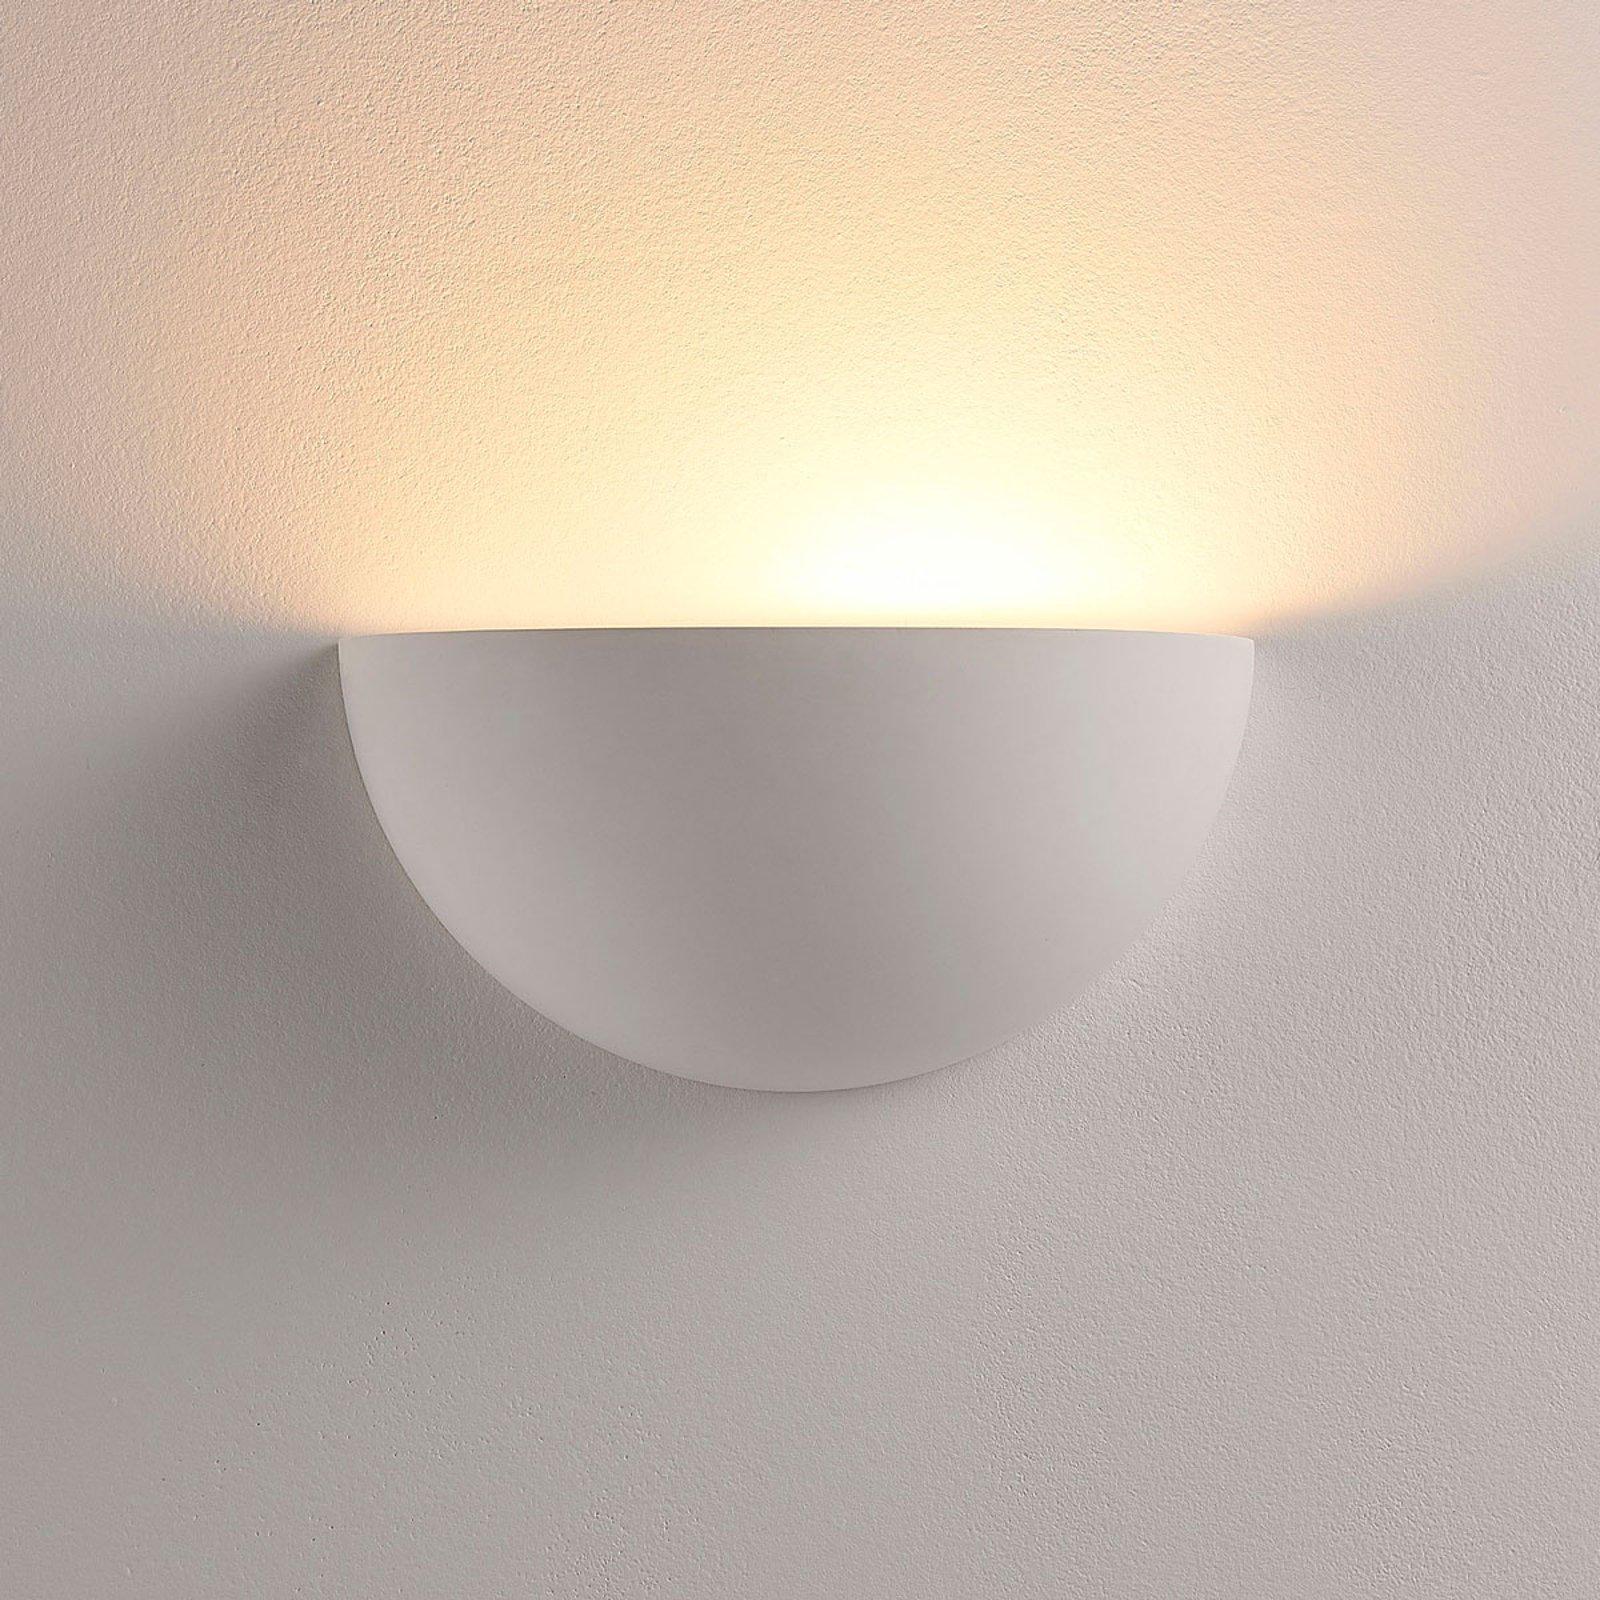 Halvrund LED-spot Narin i gips, hvit